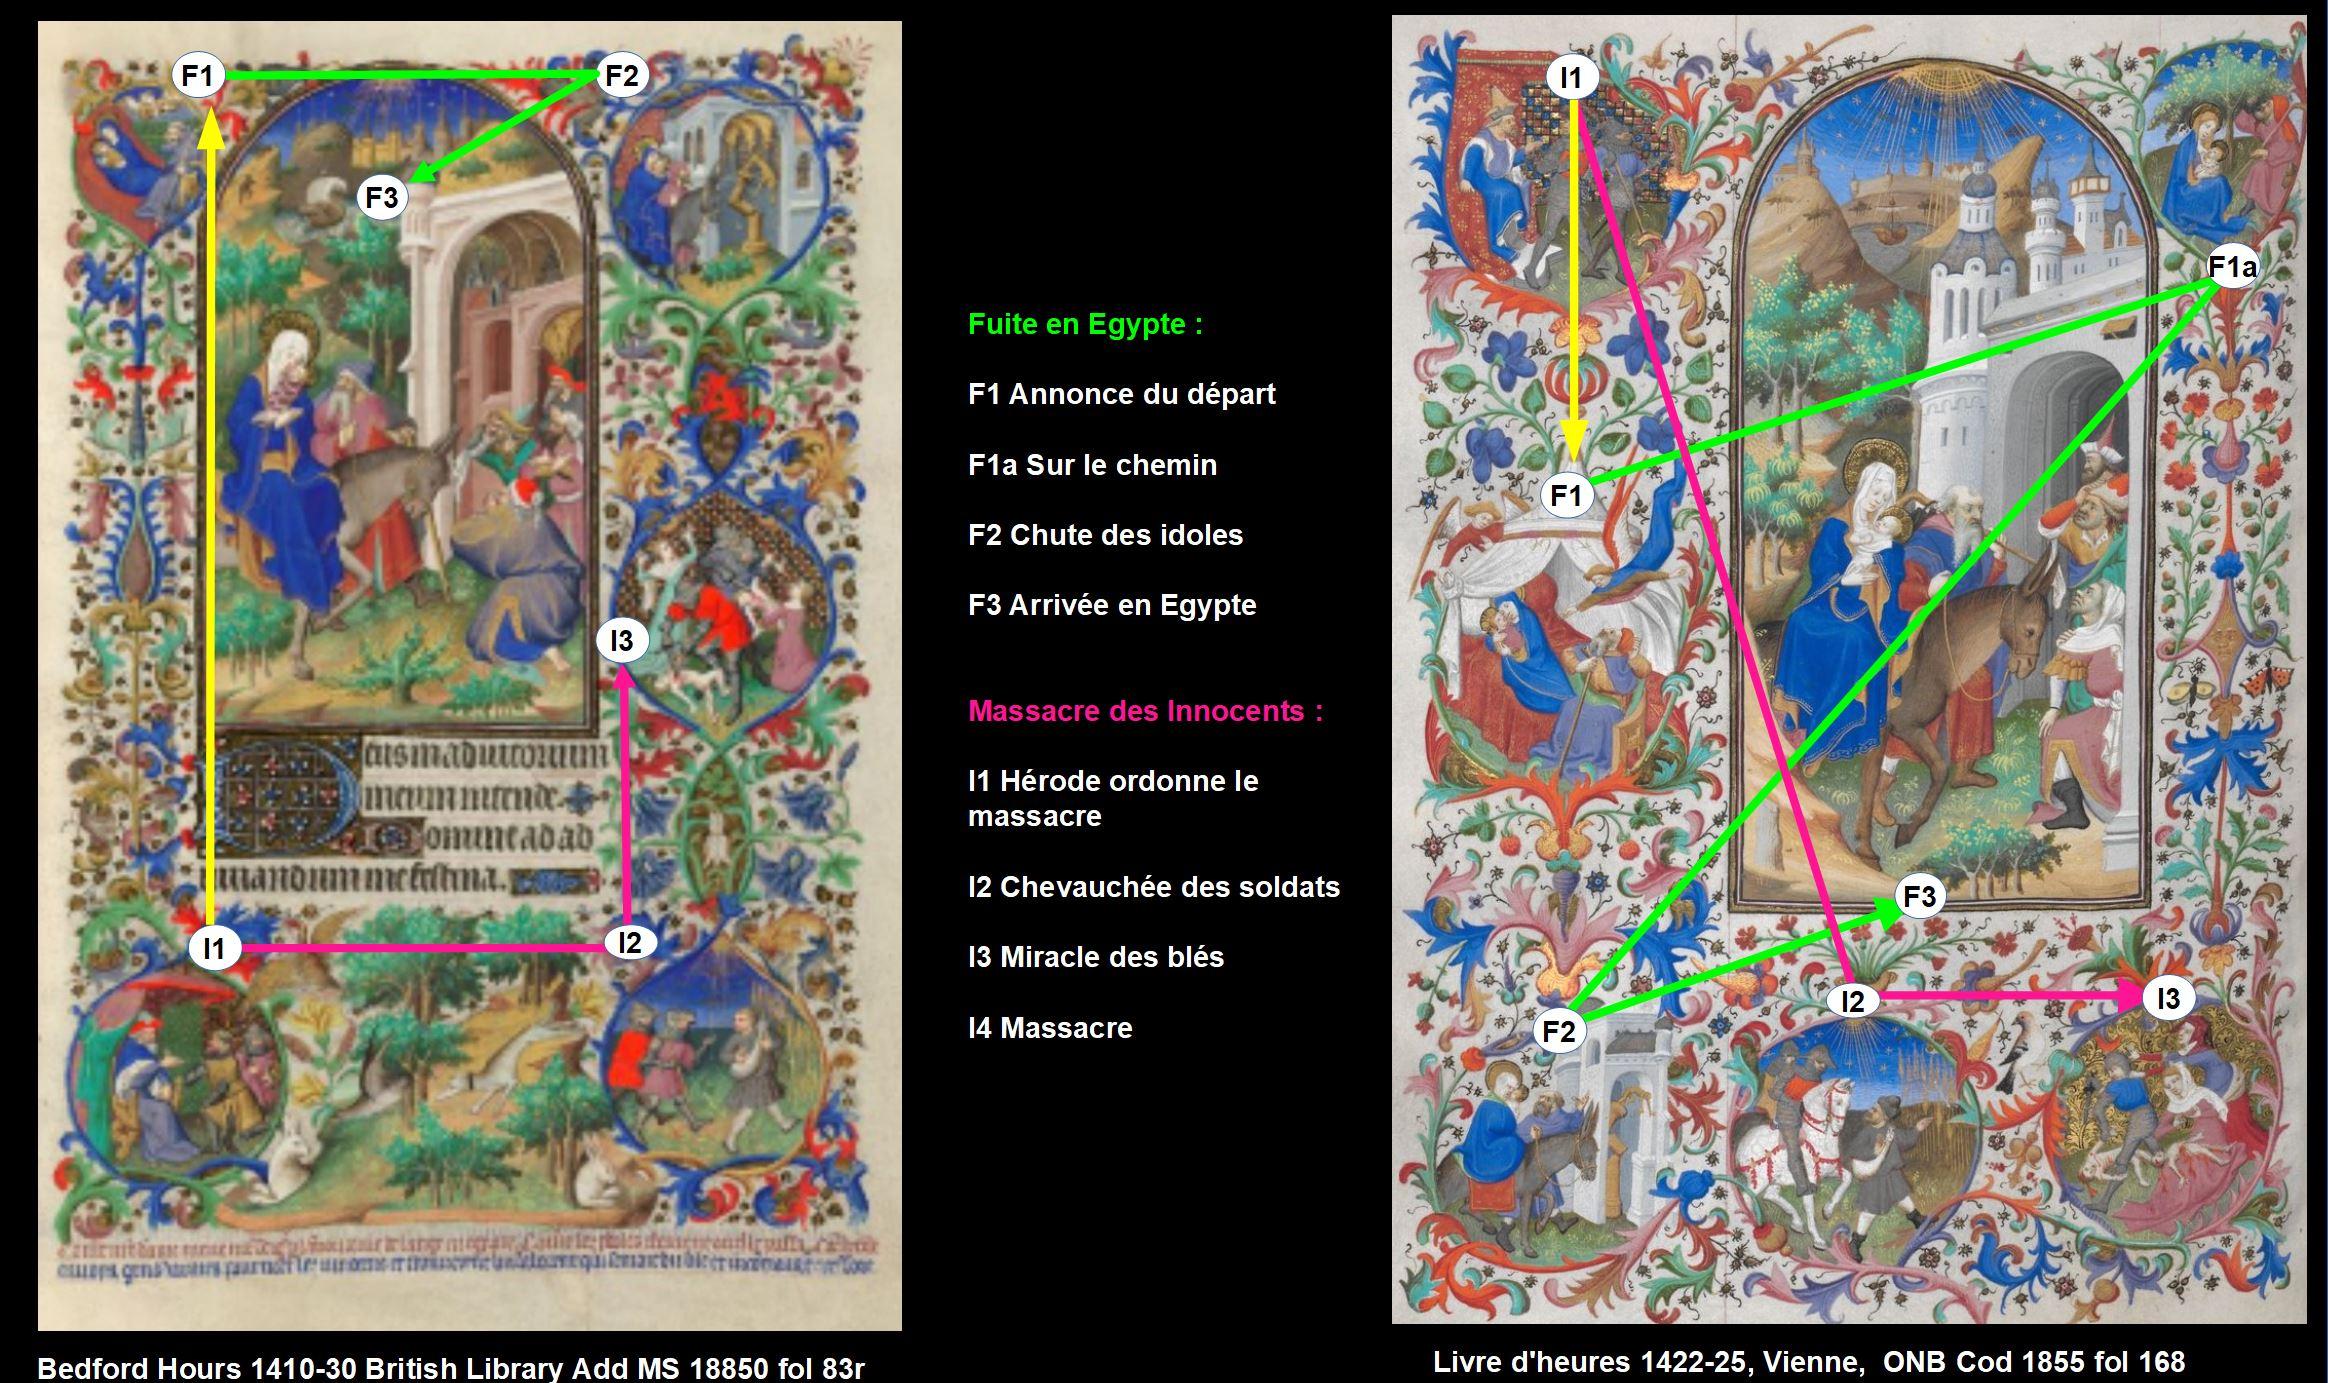 Bedford Hours comparaison Bedford 1855 Innocents Fuite Egypte